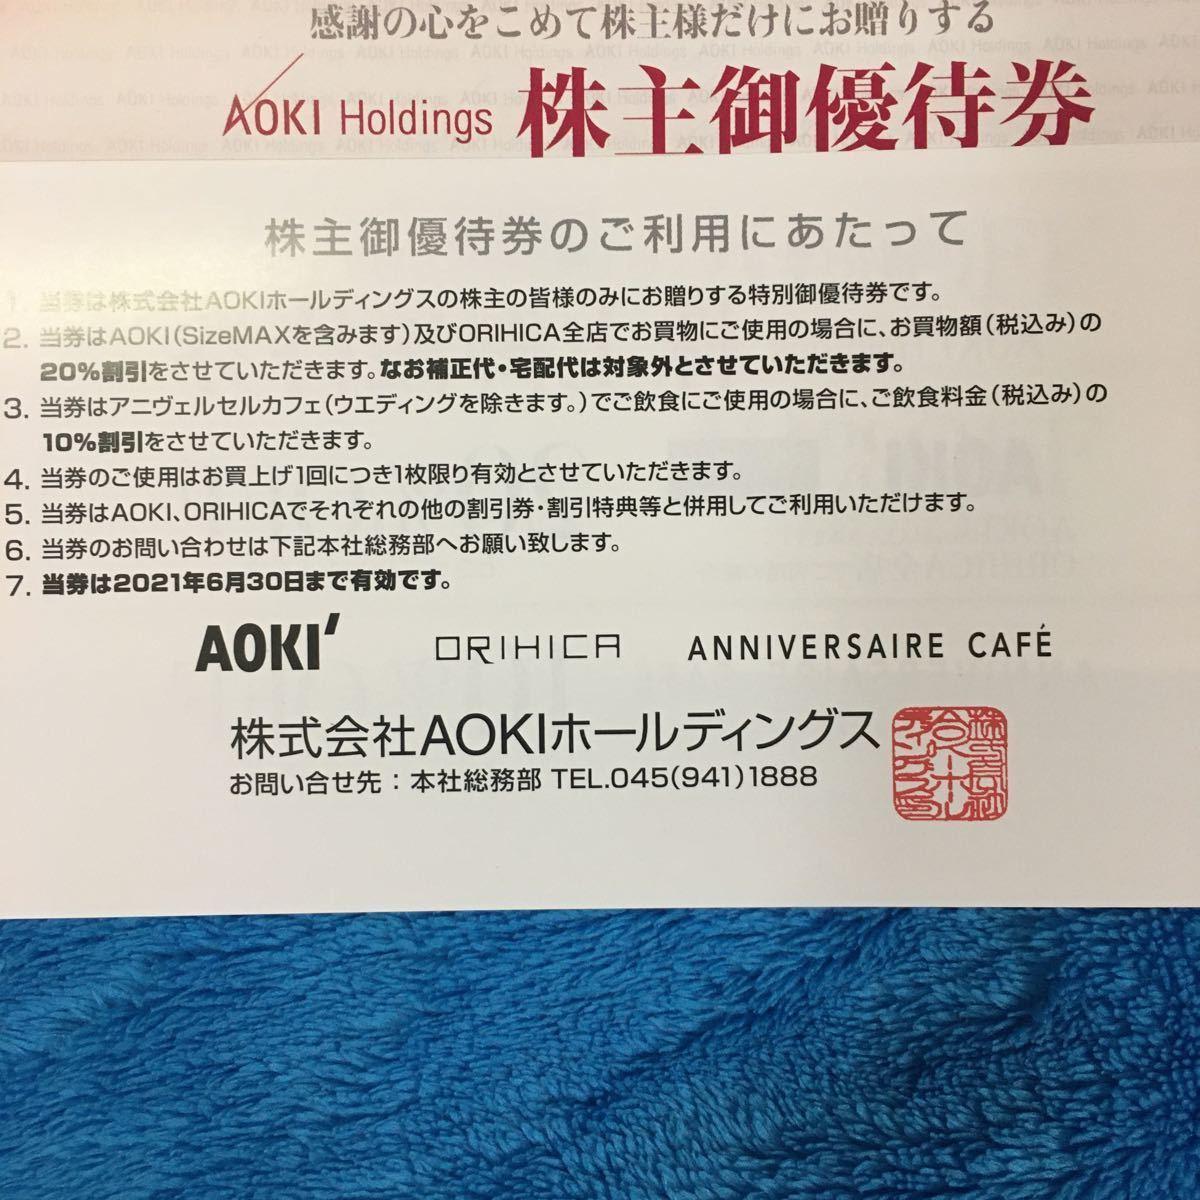 AOKI(アオキ)・ORIHICA株主優待券2枚セット 20%OFF ミニレター対応63円 アオキ・オリヒカ 2021 年9月 30 日まで 延長_画像2